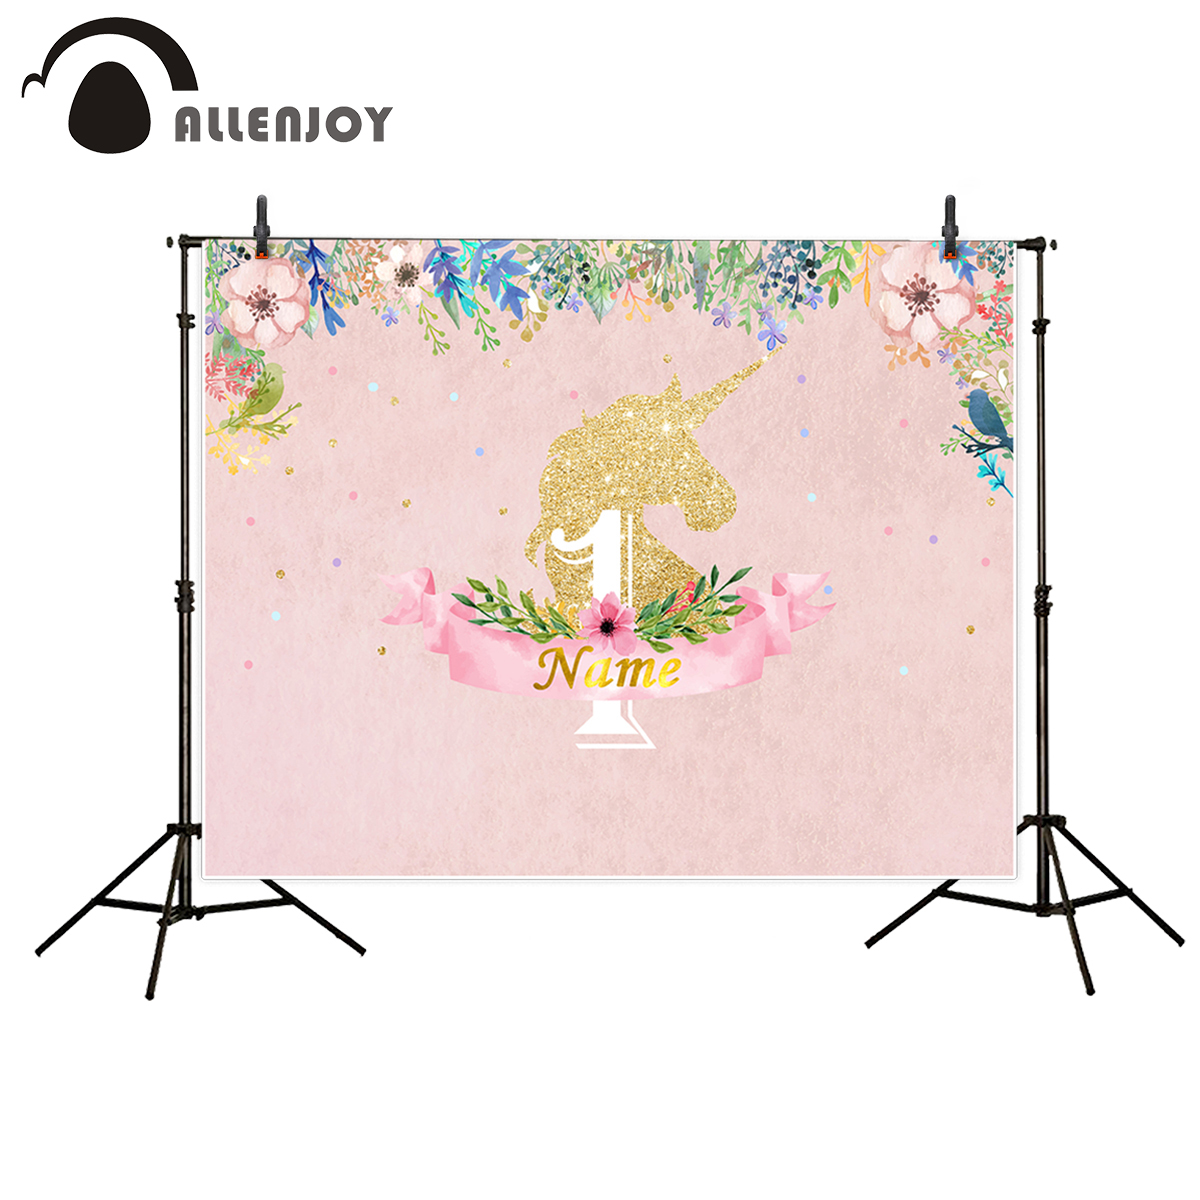 Allenjoy photography backdrop unicorn pink flower birthday theme party photobooth background for kids photocall unicorn party theme backdrop for photography newborn birthday photo props for fond studio background fundo photocall 7x5 kate